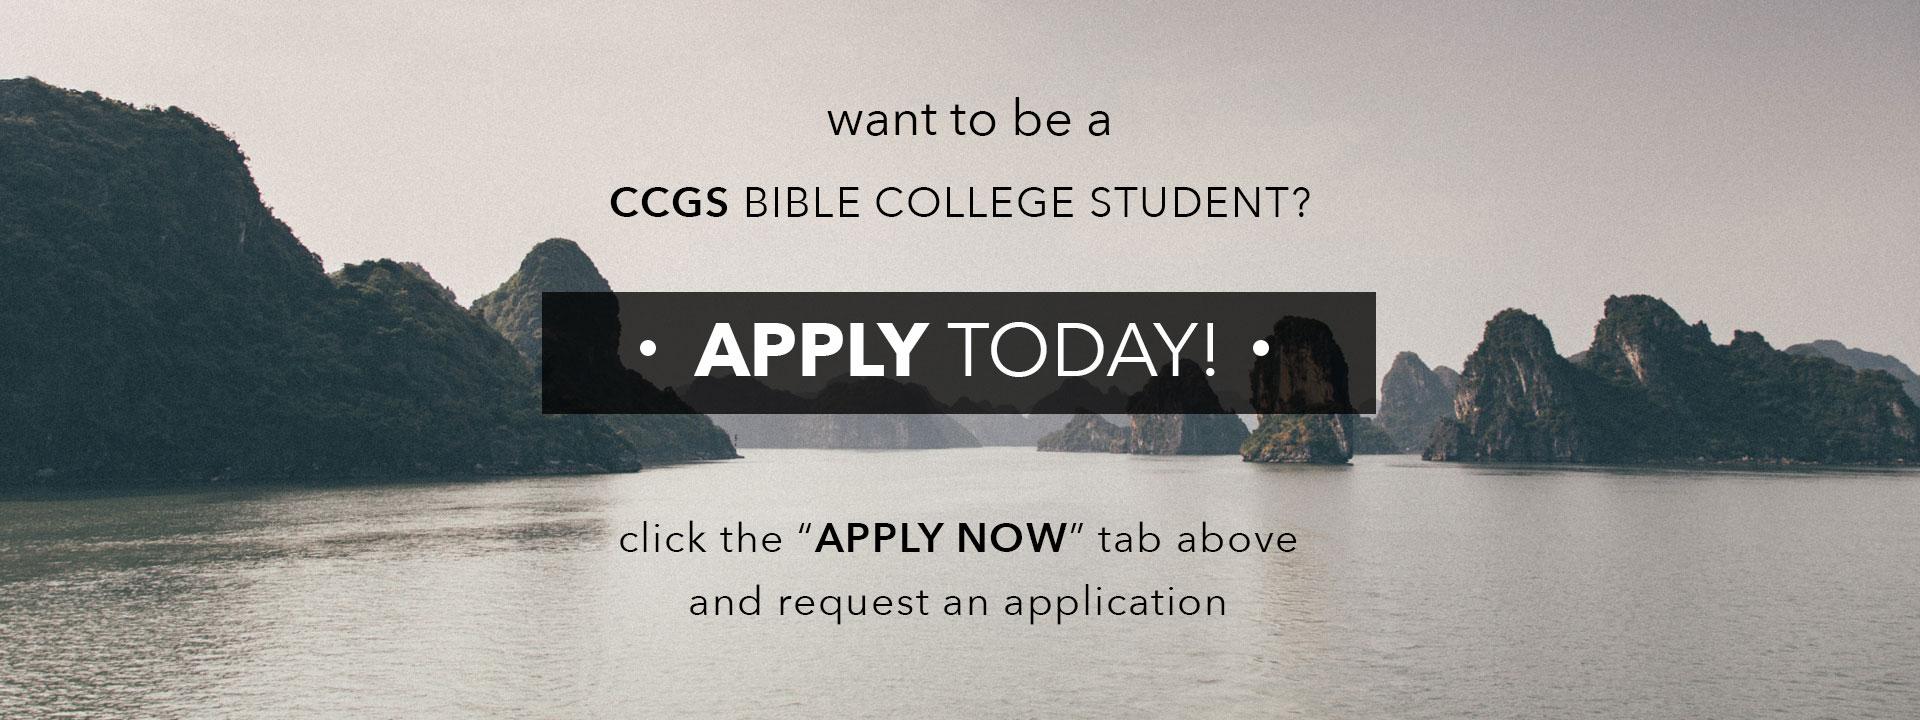 applytoday